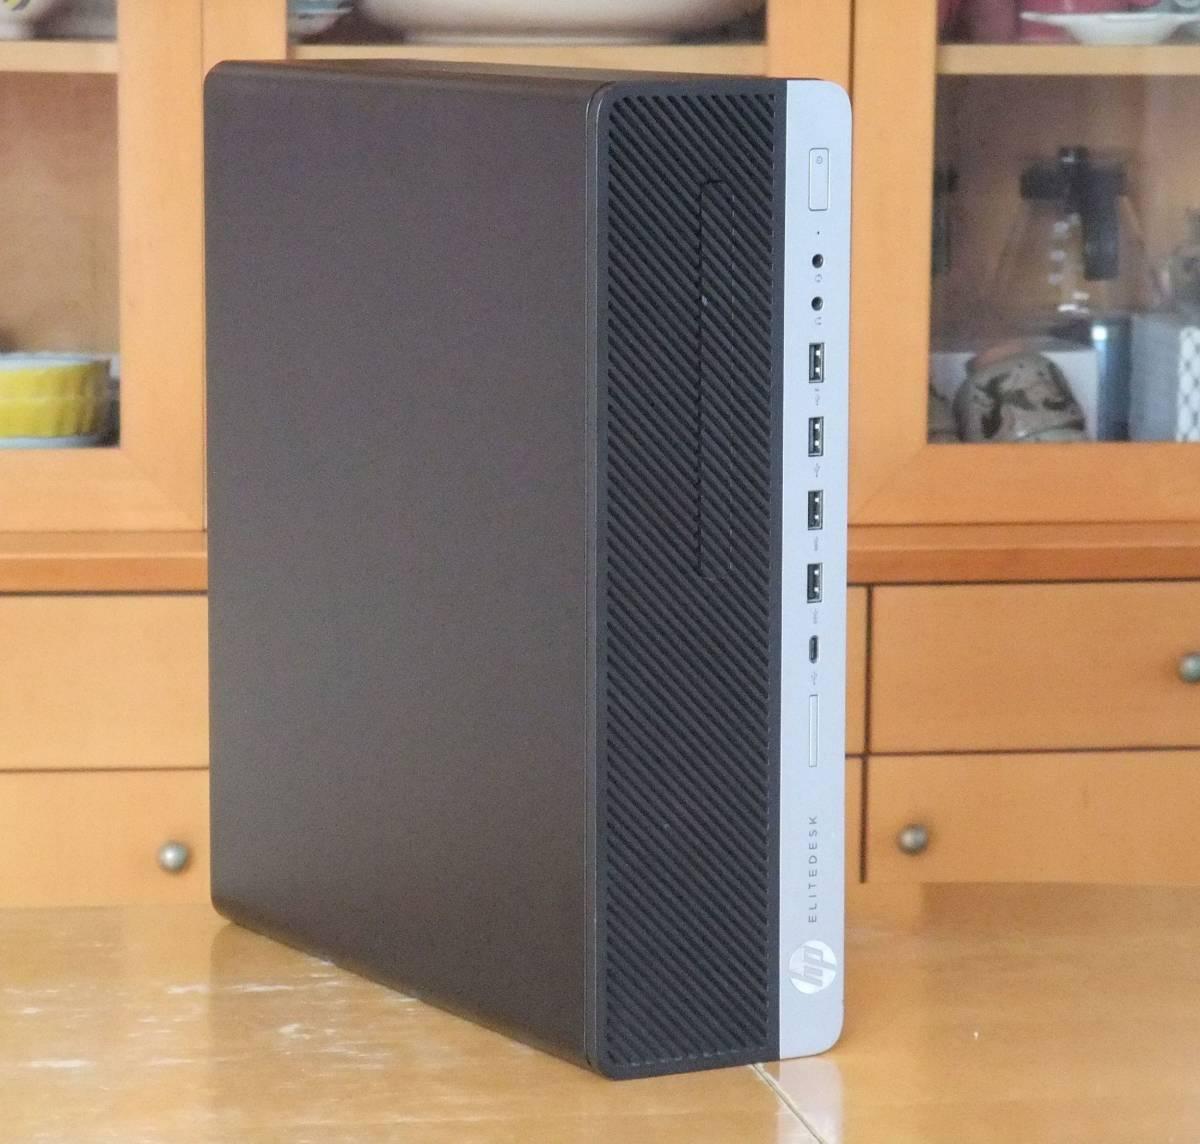 ☆第7世代i7-7700 4.2Gx8/大容量32Gメモリ(DDR4)/新品SSD1000G/Office2019/Win10/USB3.0/